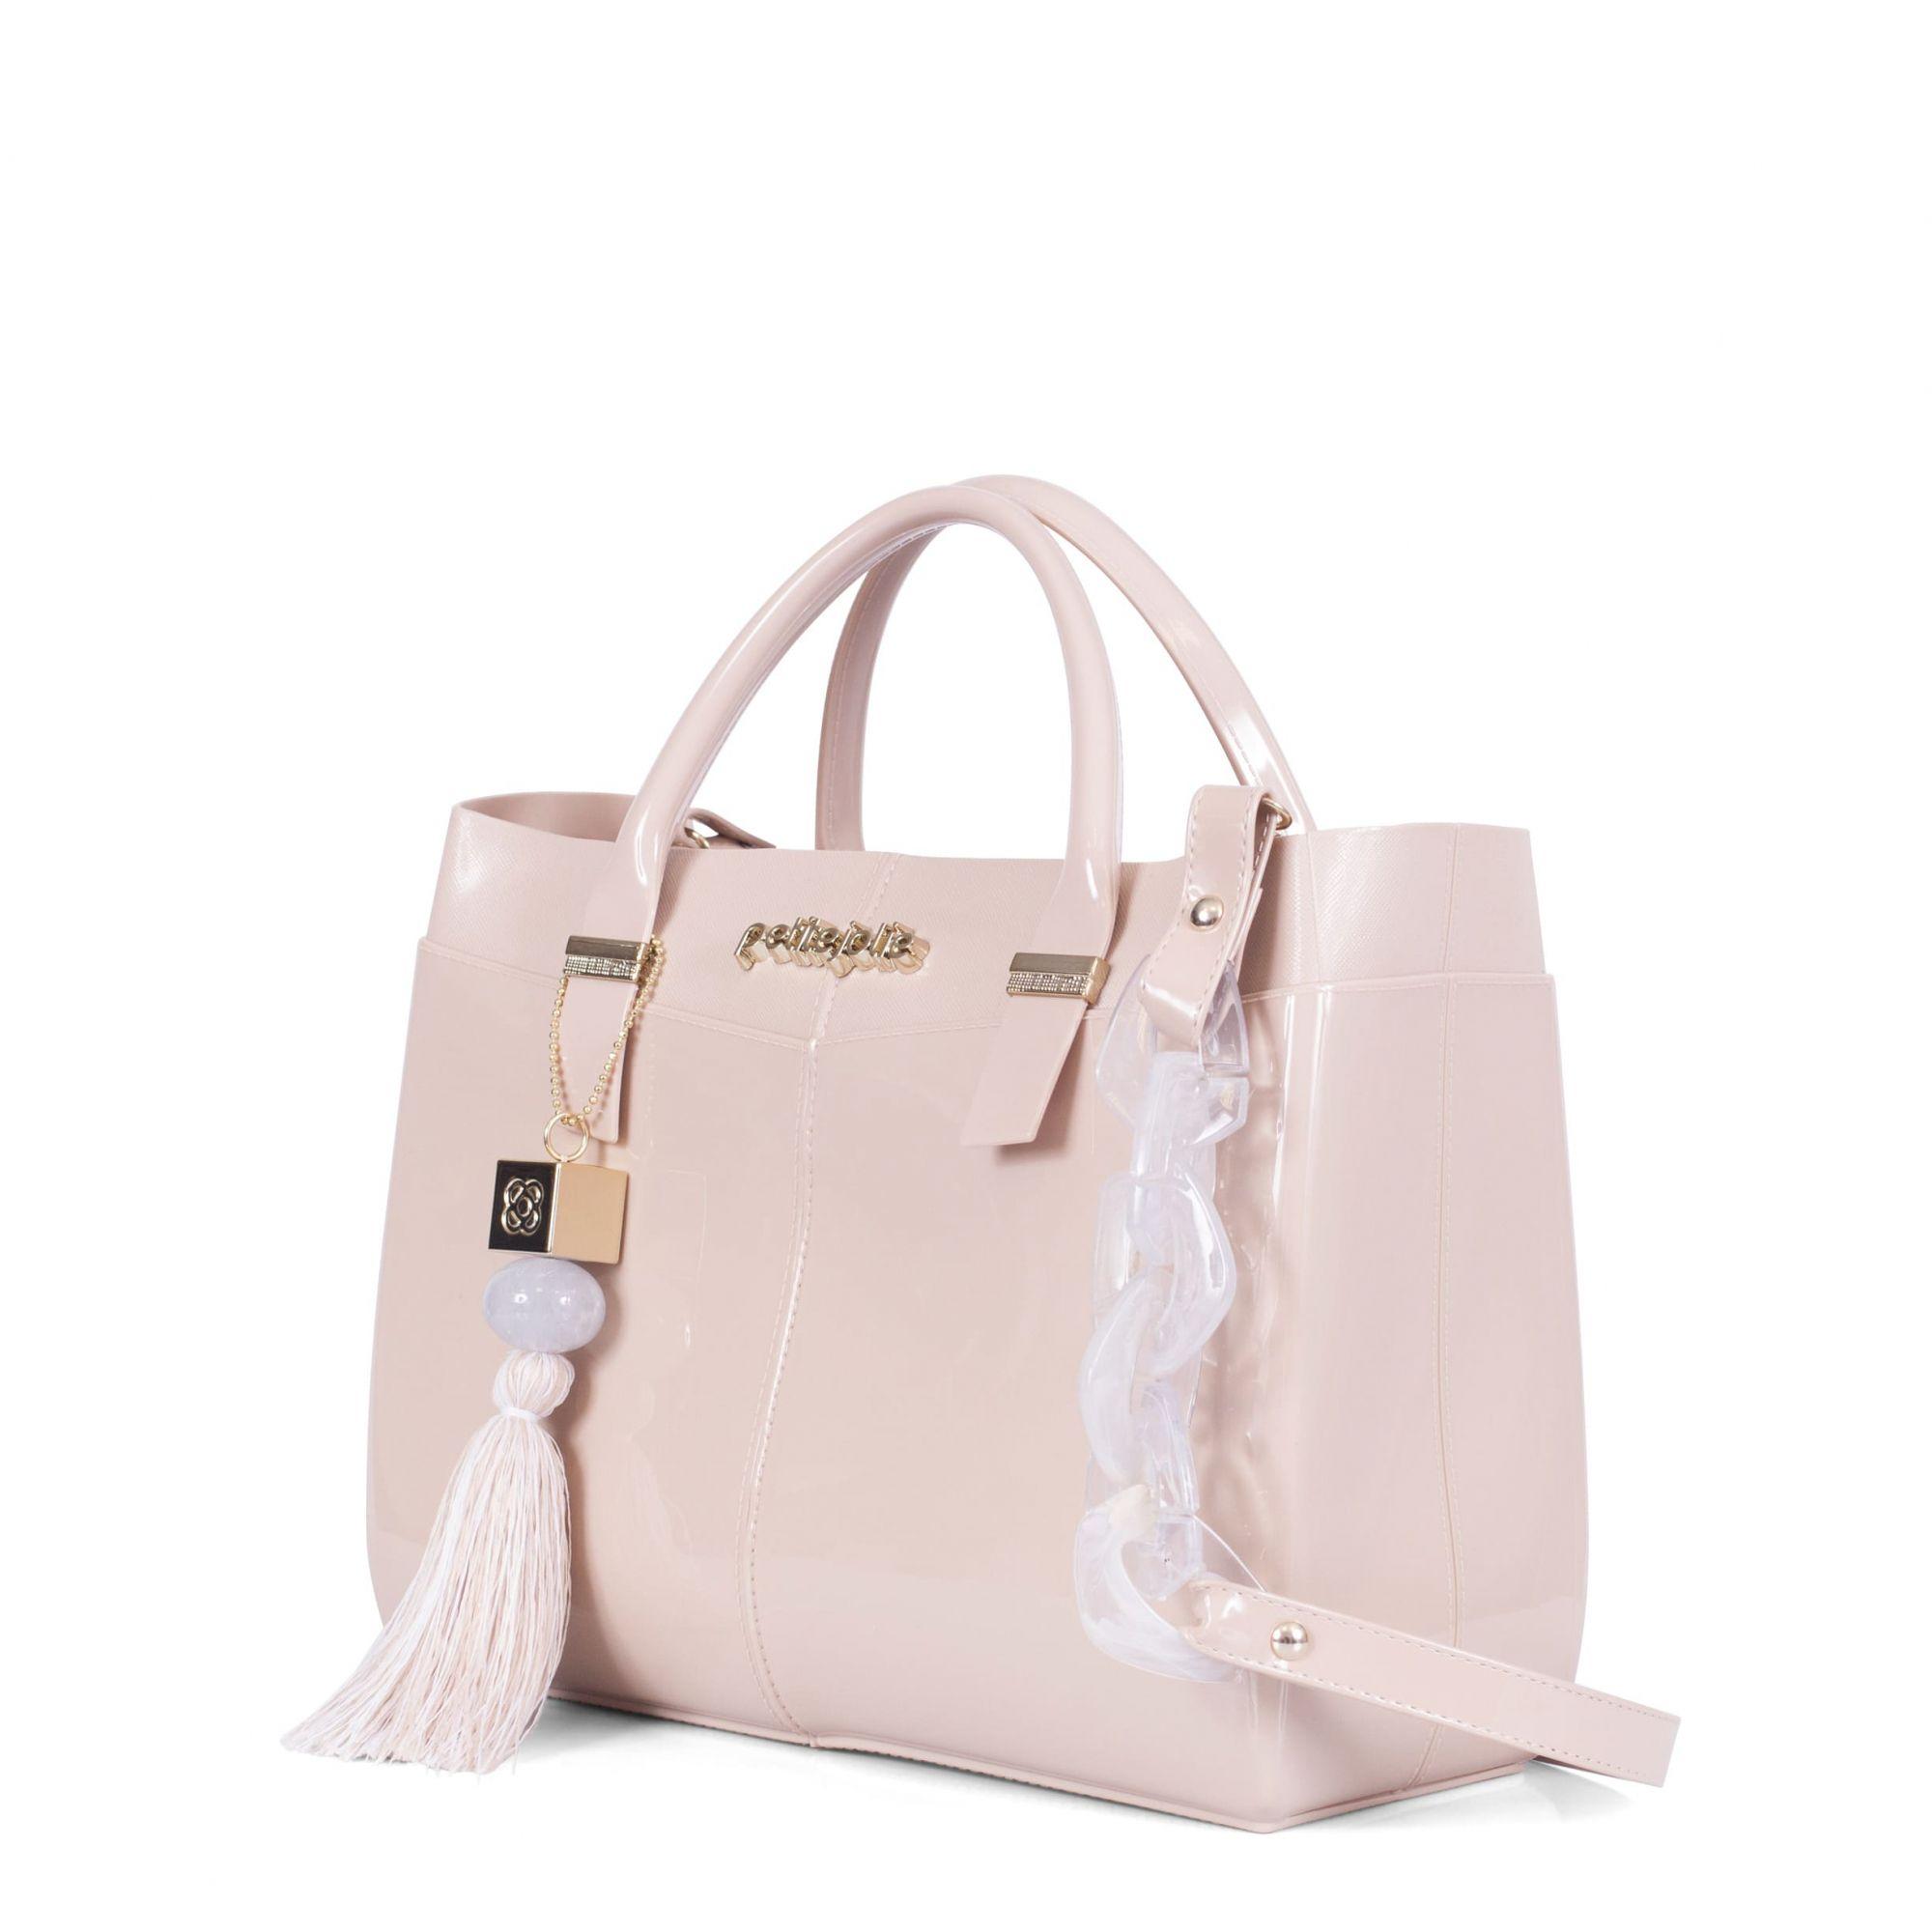 Bolsa Petite Jolie Worky Bag PJ3799   - Prime Bolsas